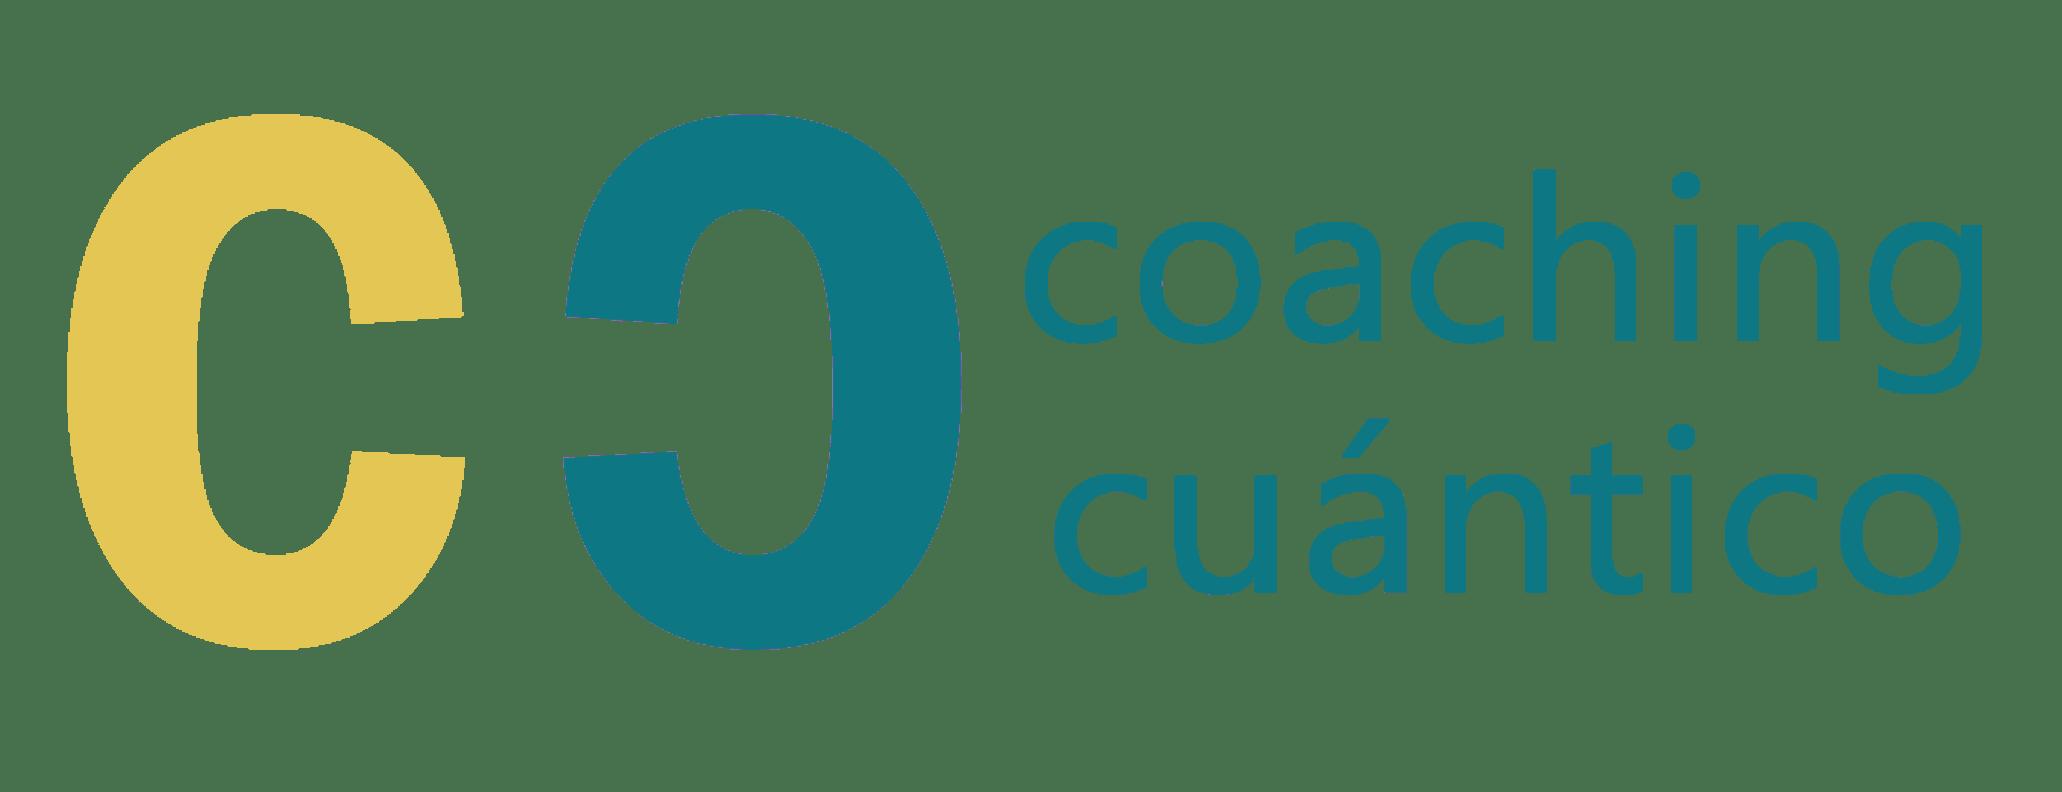 Coaching Cuantico